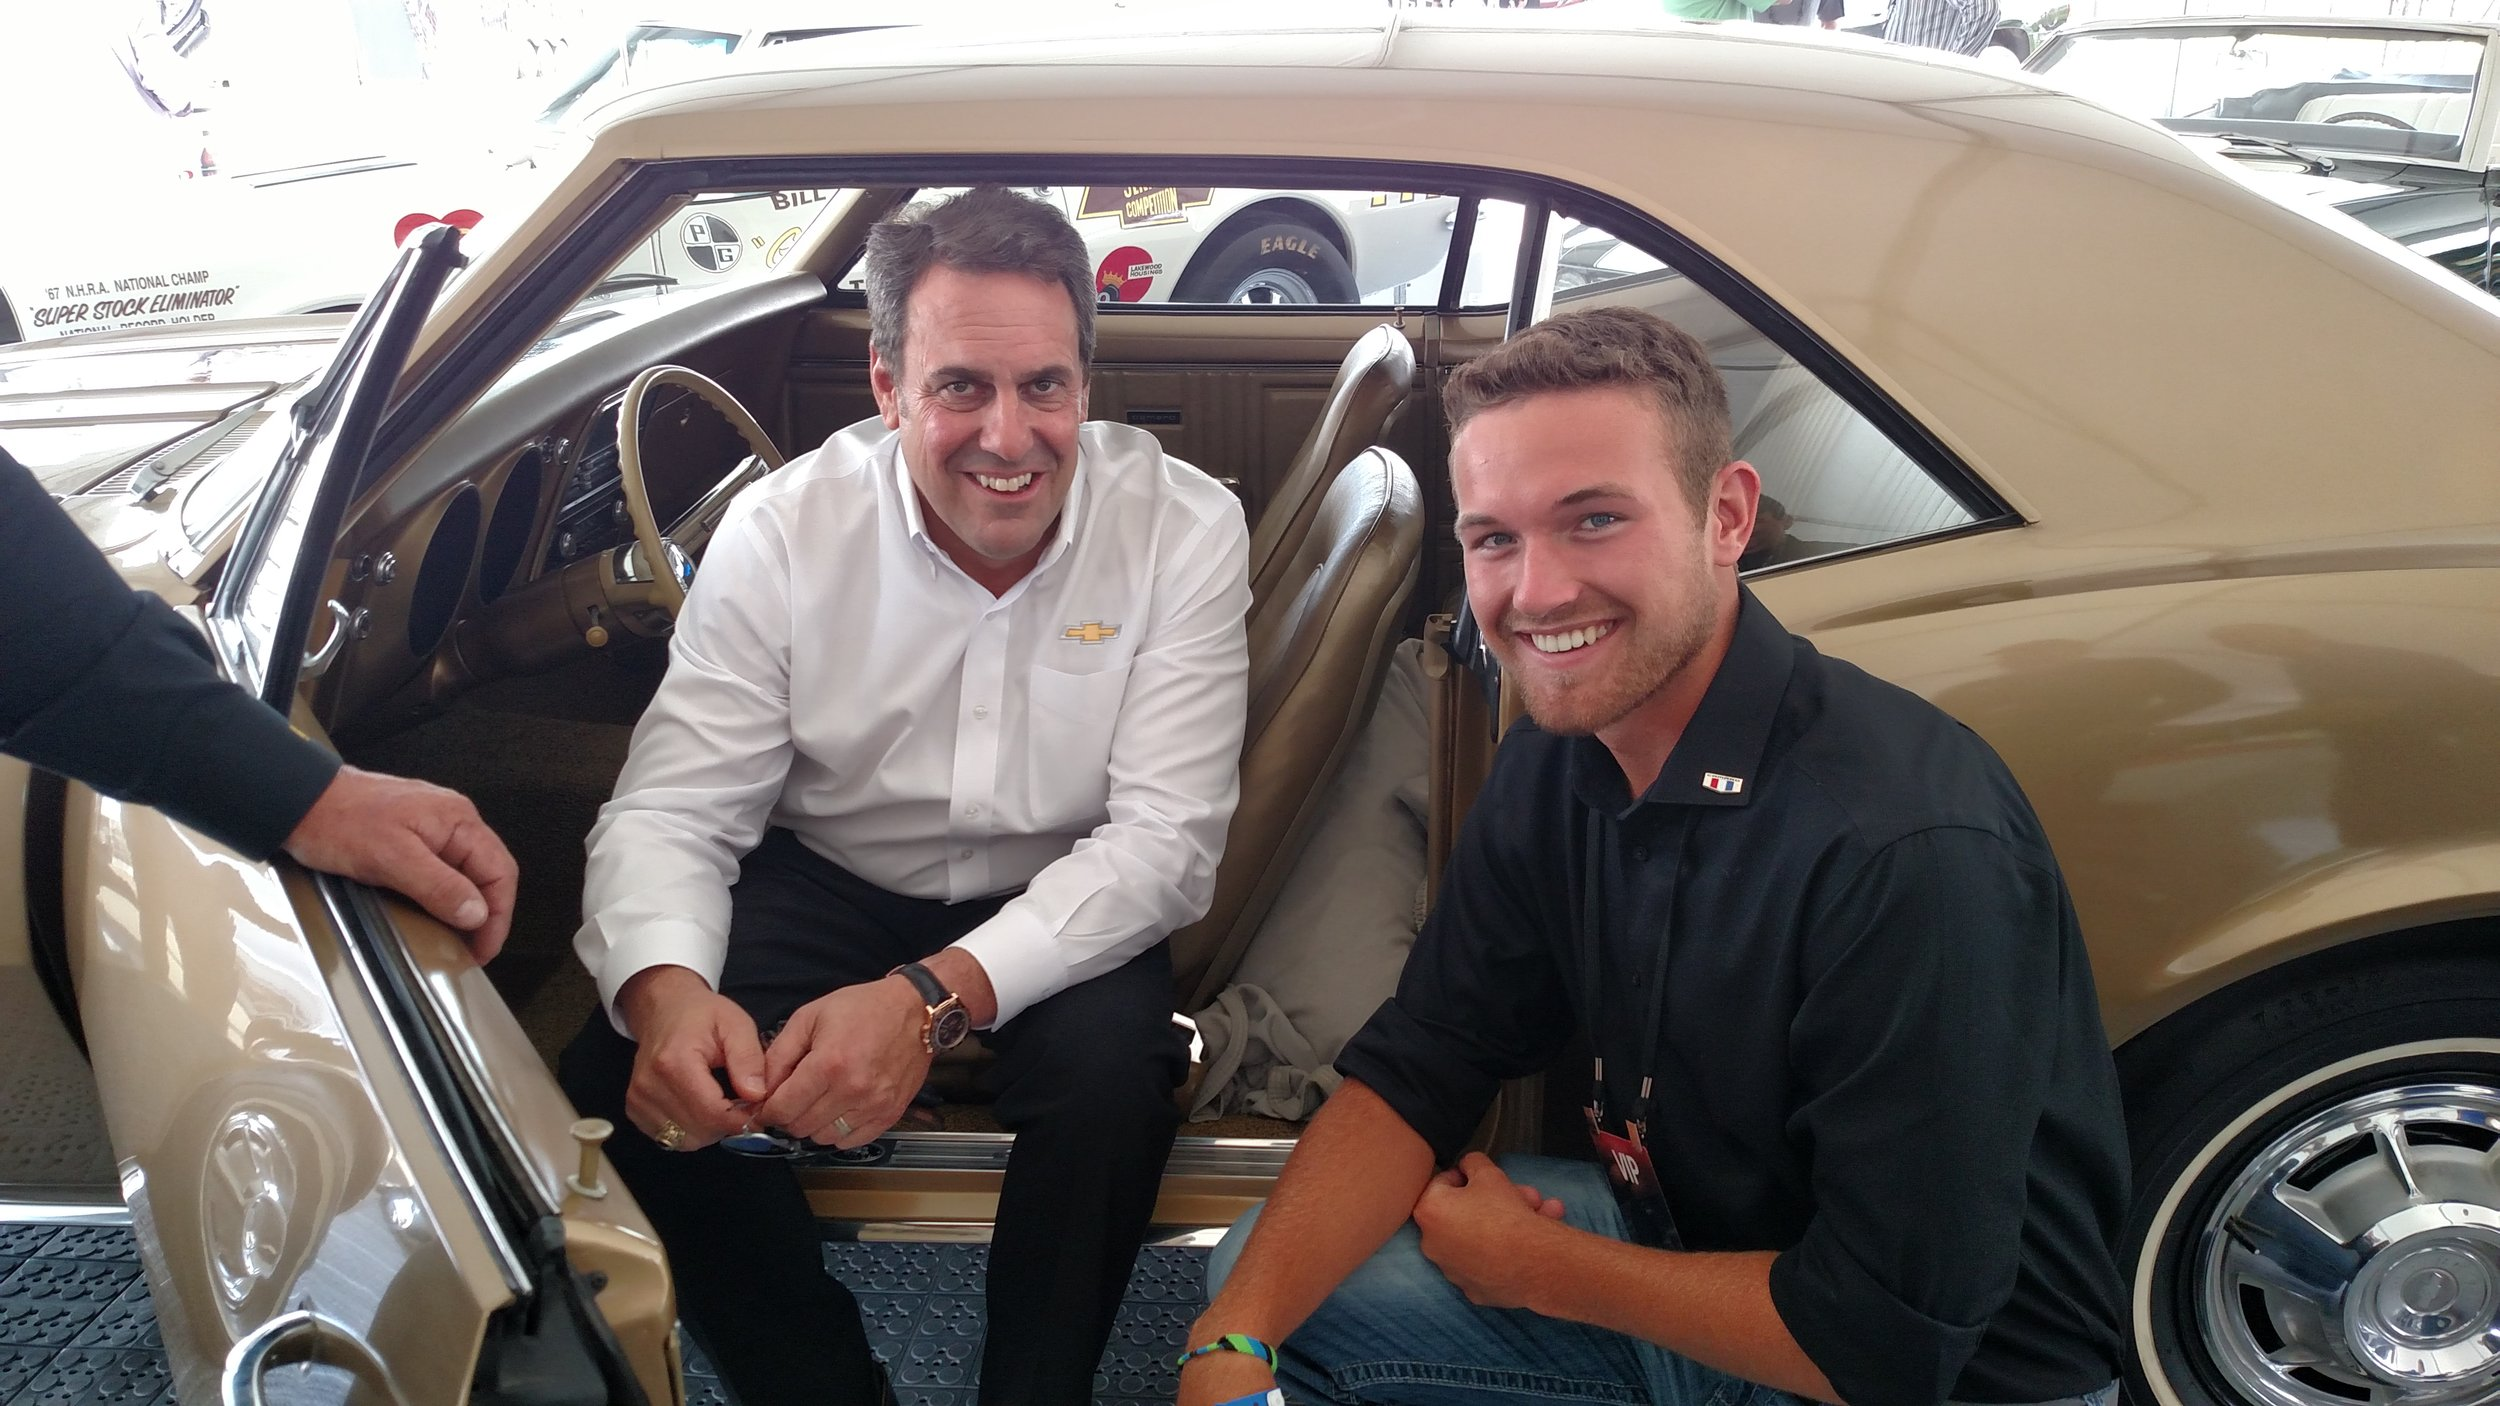 Mark Reuss, President of General Motors North America, and Logan Lawson of the Pilot Car Registry with the serial #1 Camaro.